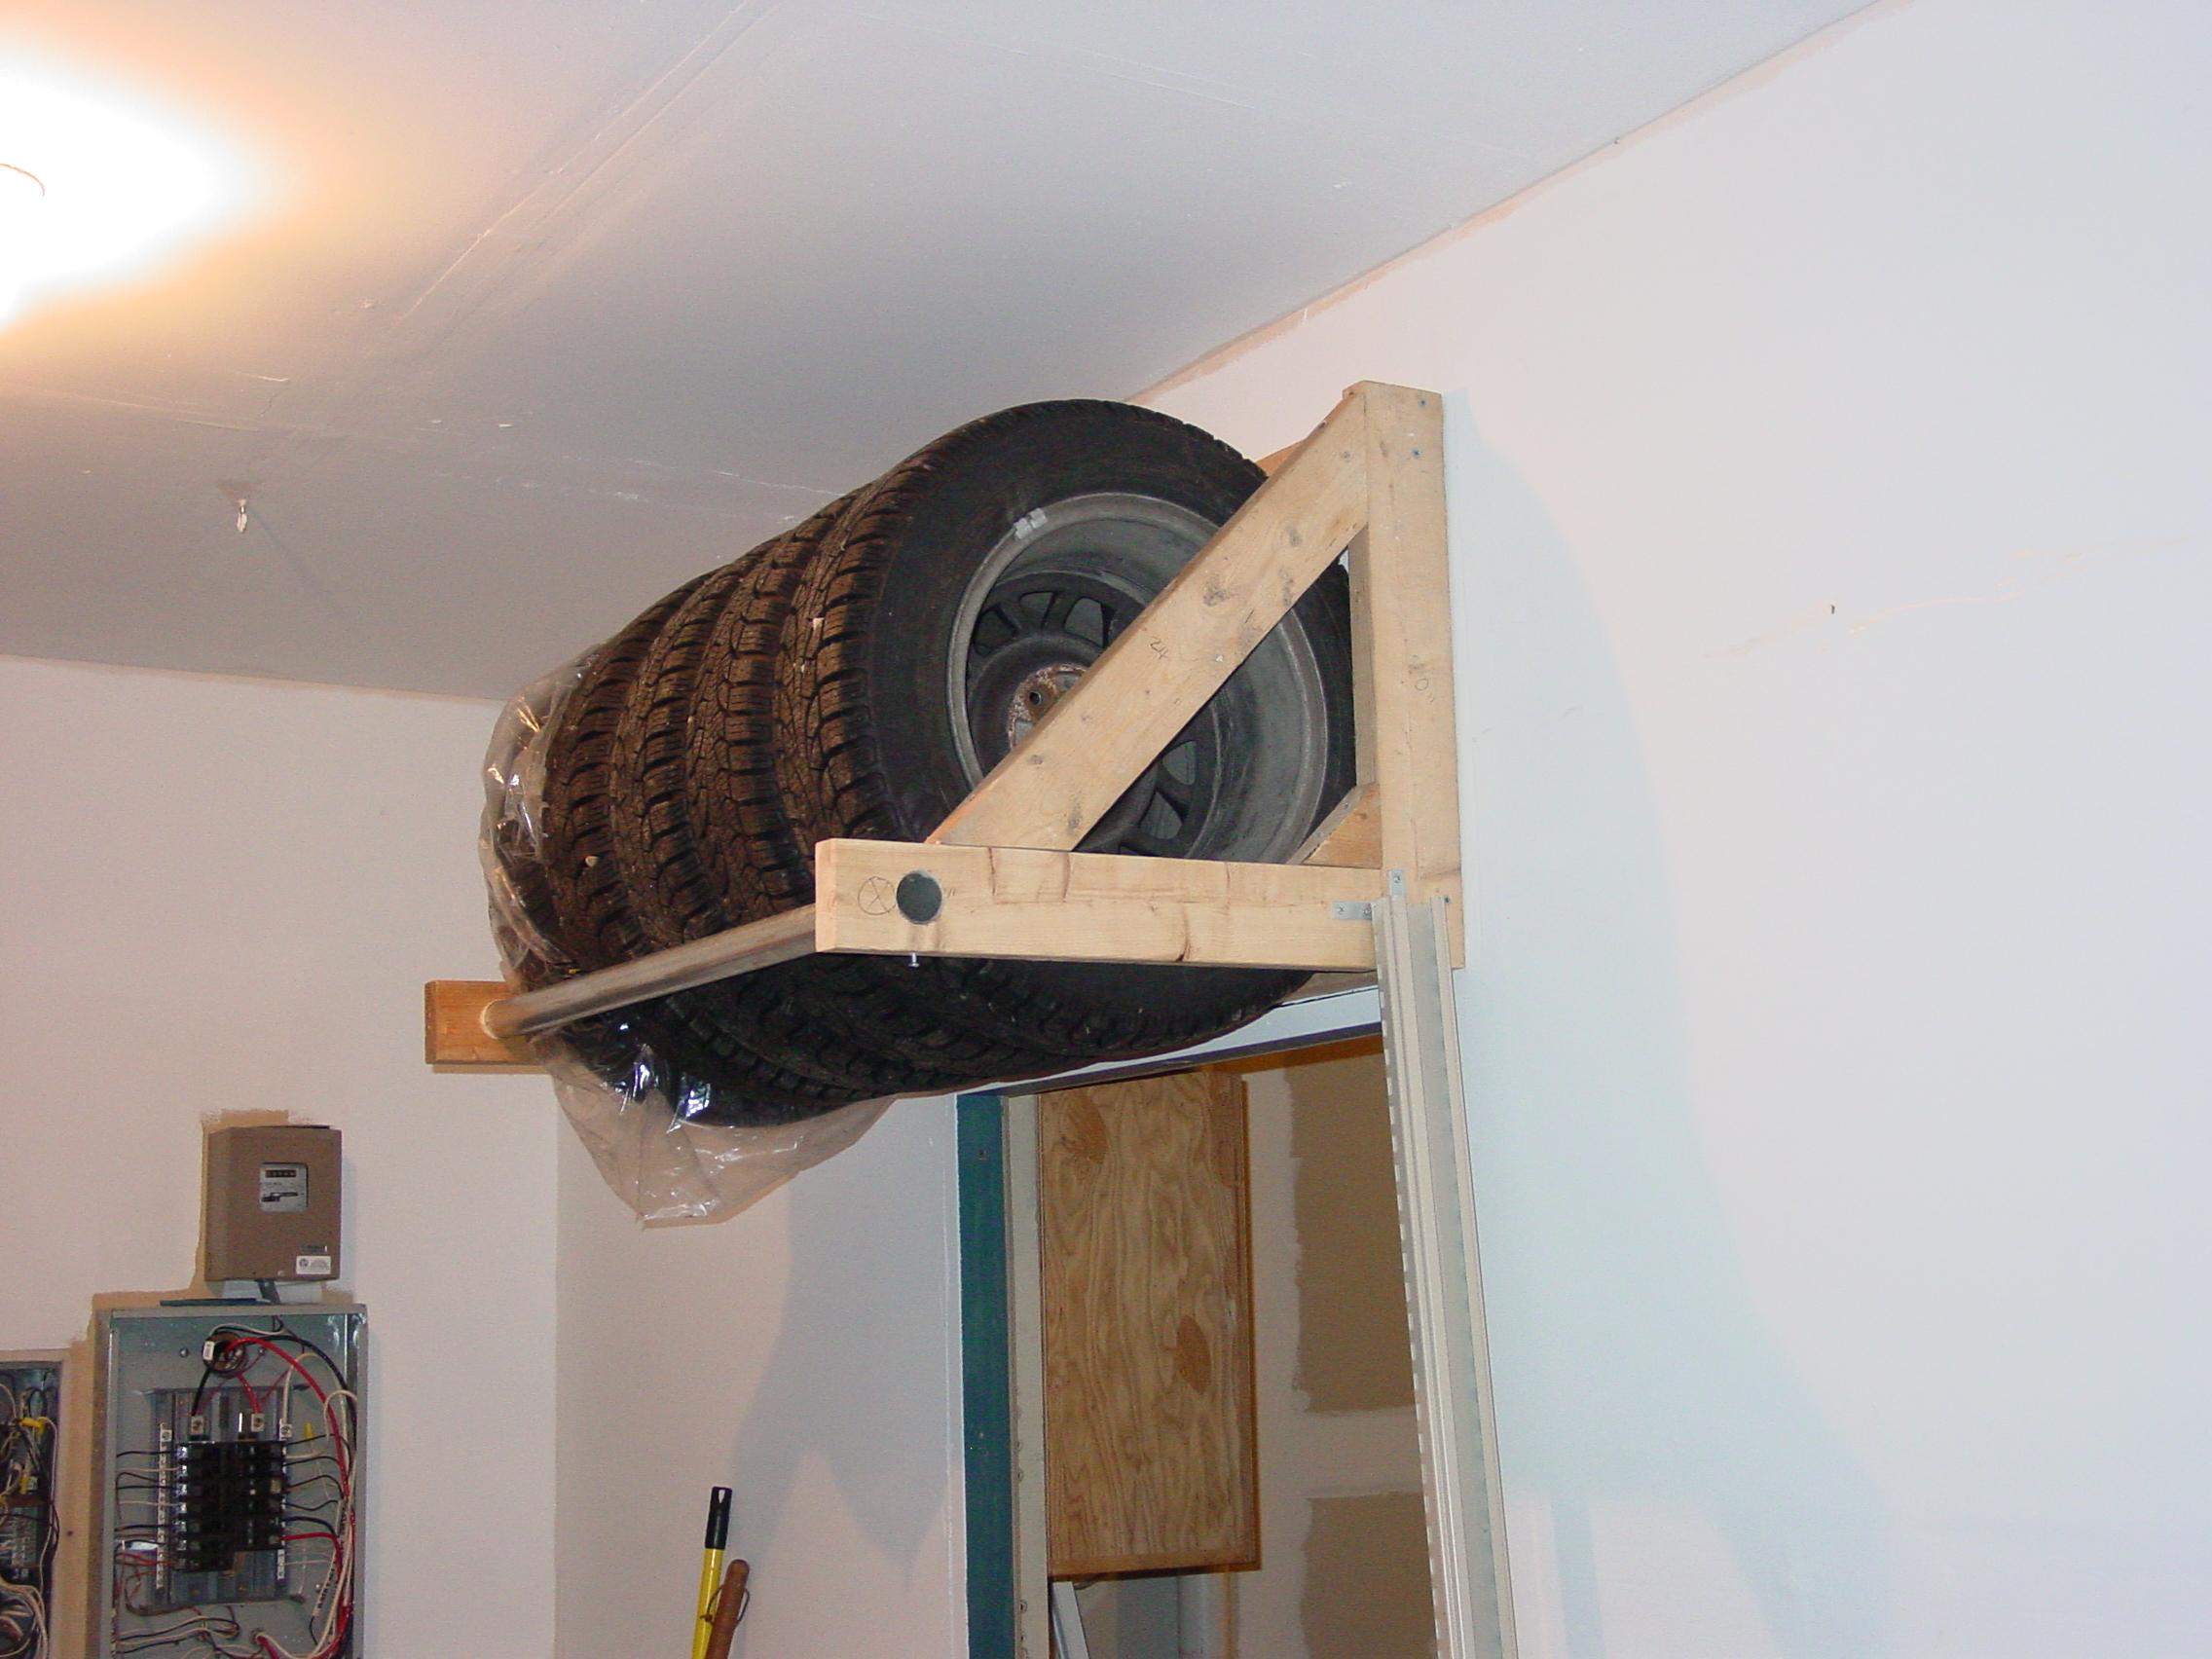 www windowssearch exp com tire rack bing images 2272 x 1704 jpeg. Black Bedroom Furniture Sets. Home Design Ideas